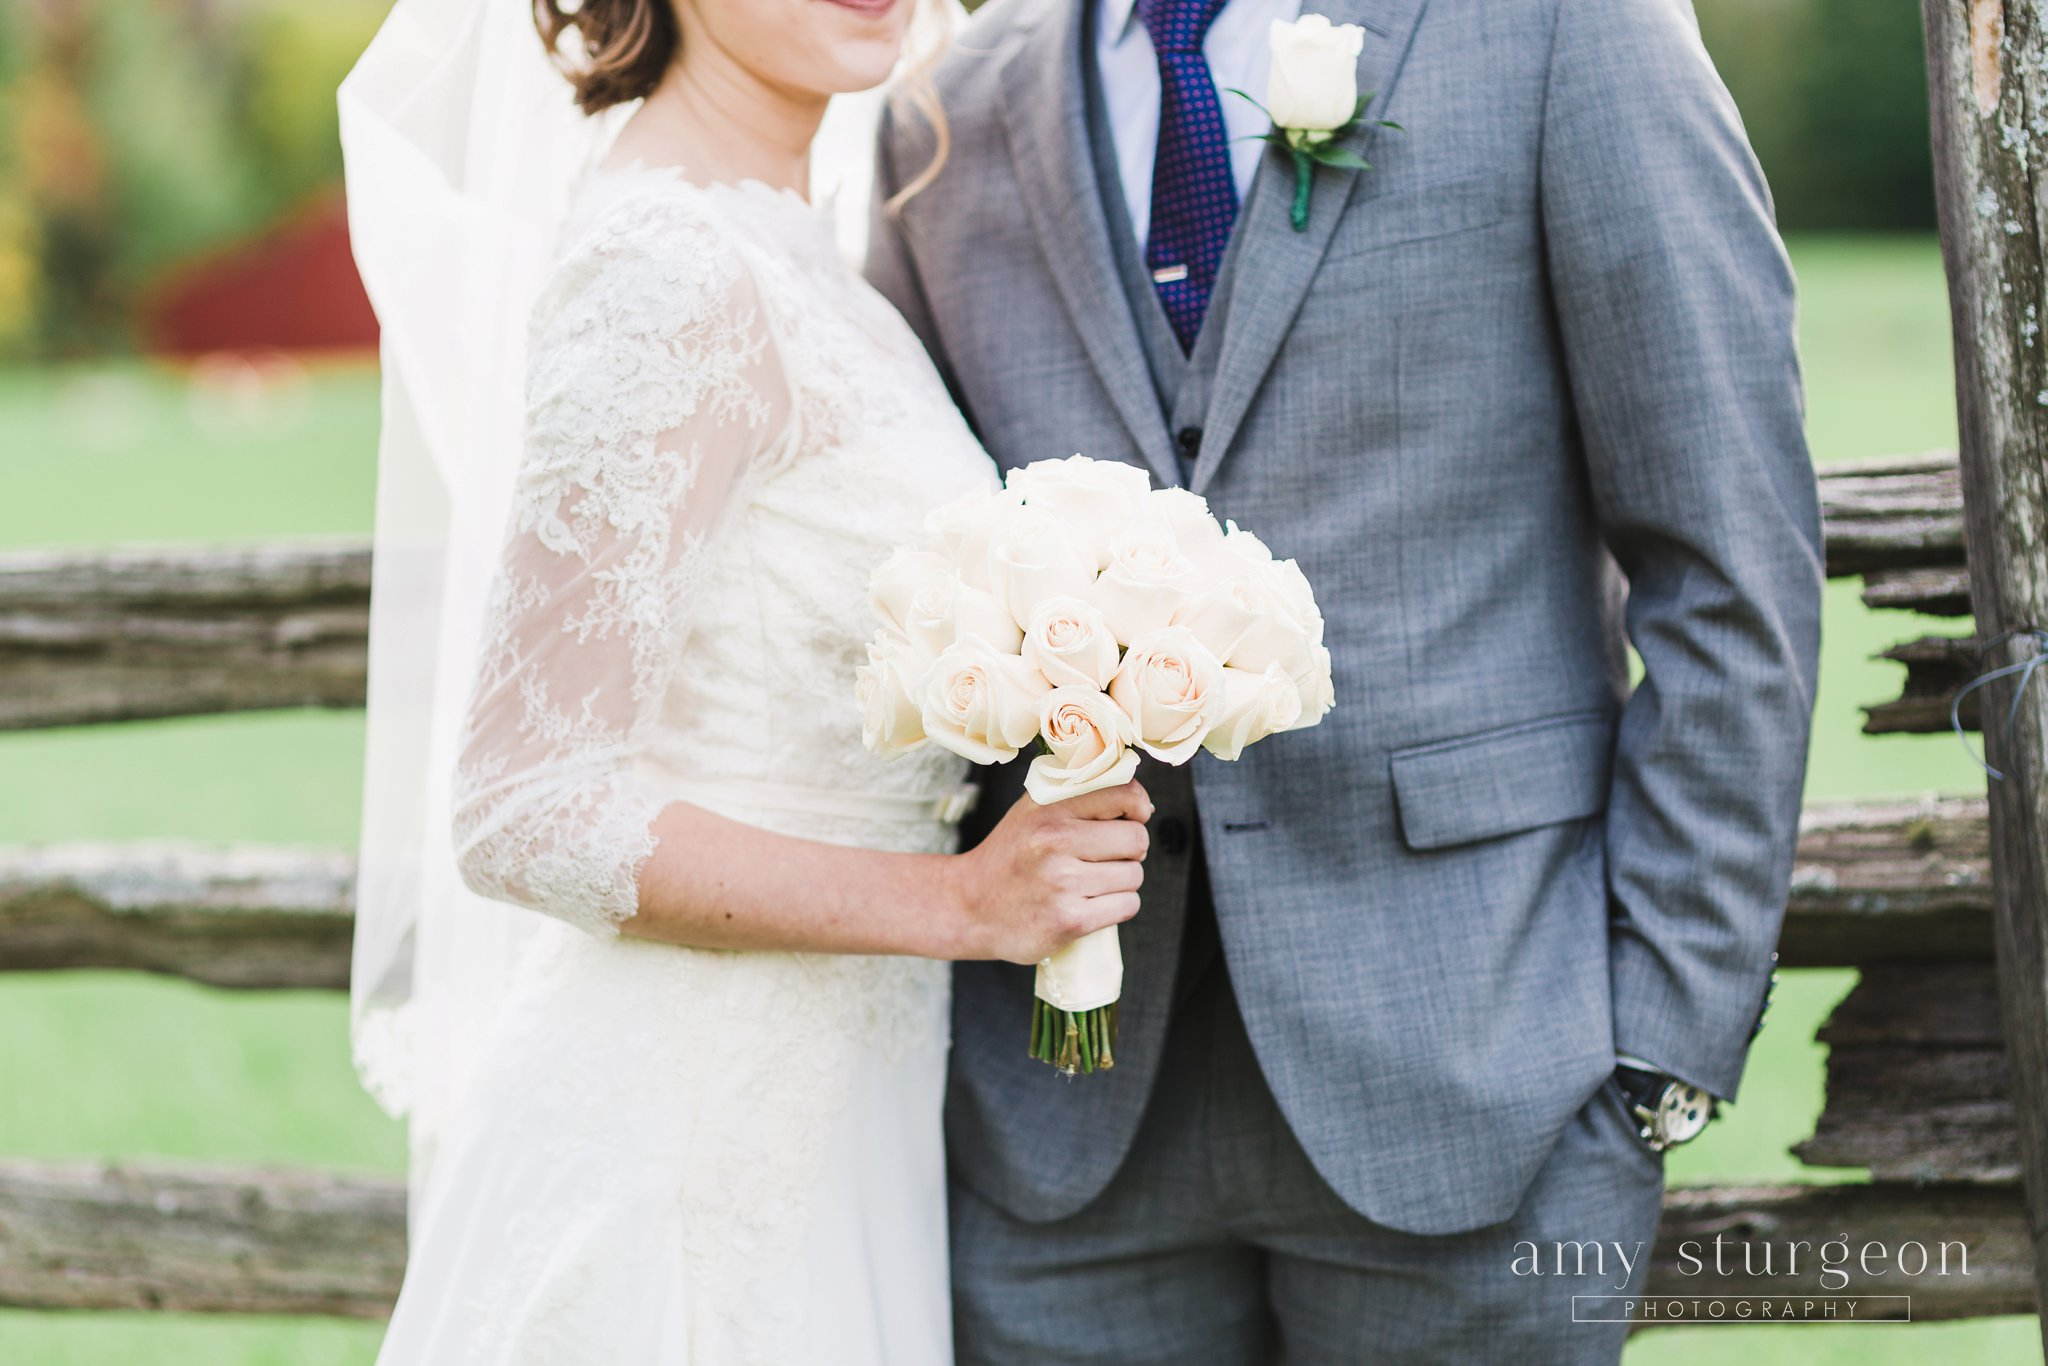 White rose wedding bouquet at the alpaca farm wedding